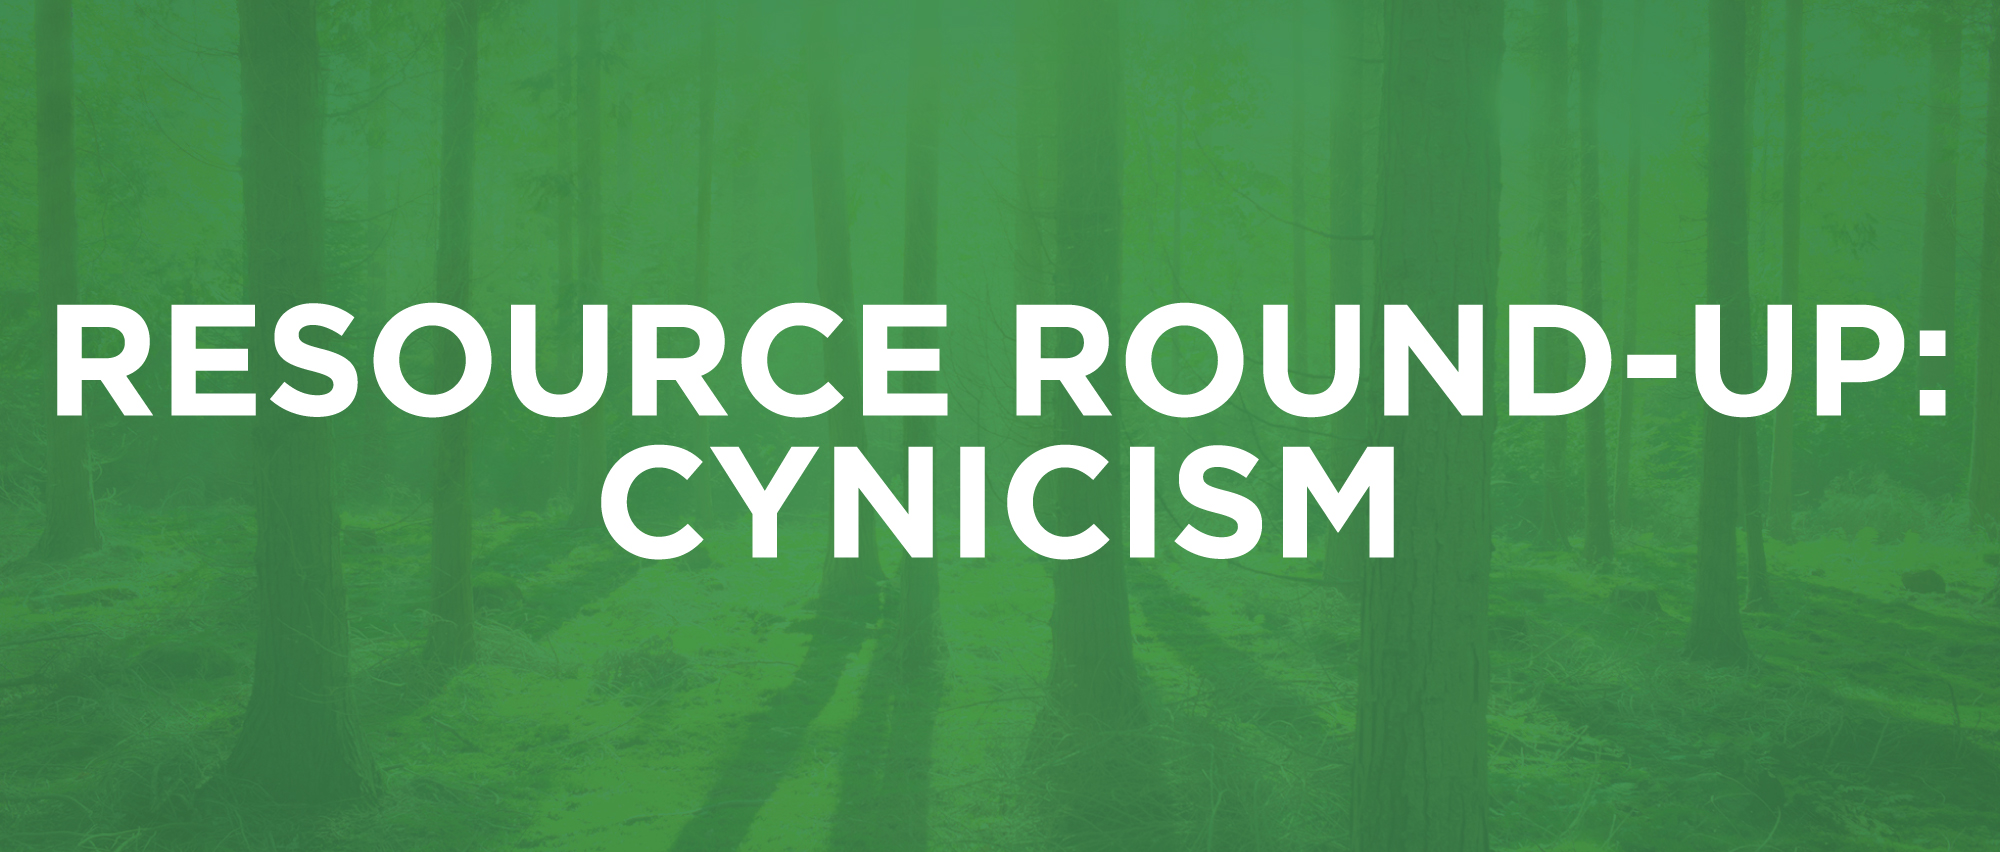 ResourceRoundup-4-Cynicism.jpg